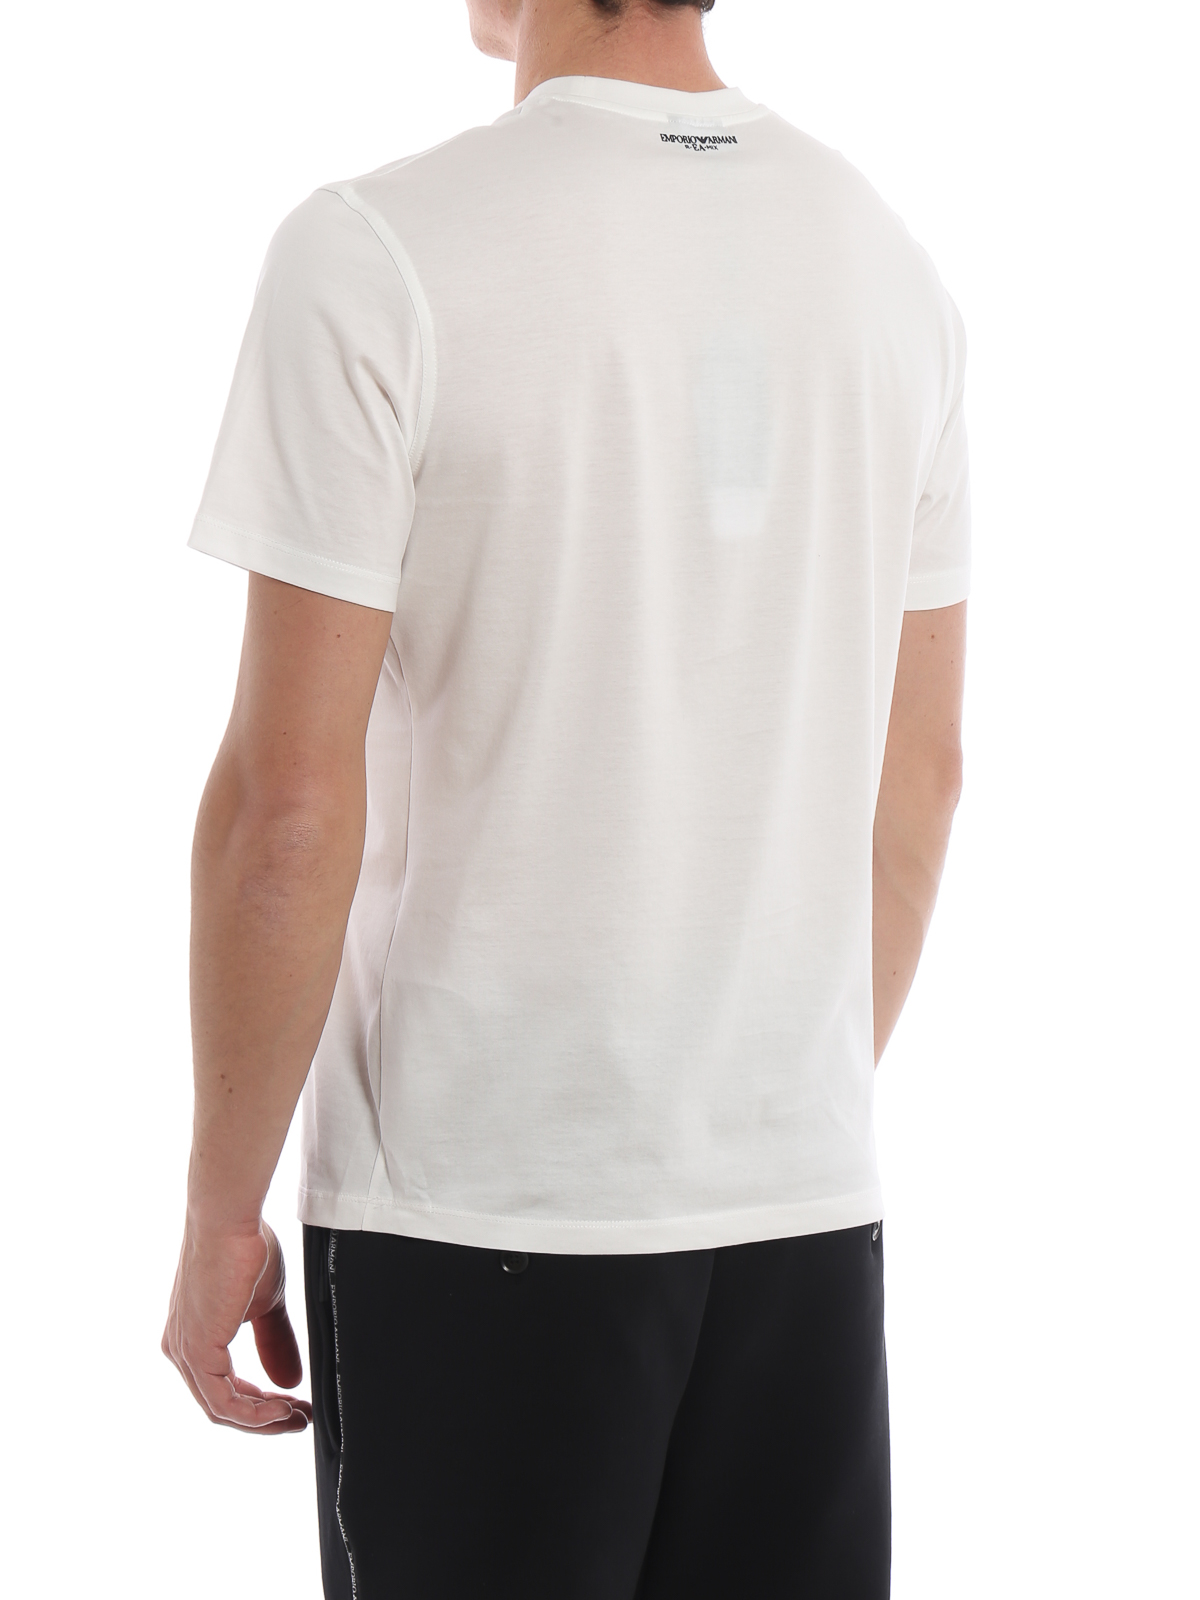 8114d11fbd Emporio Armani - Rubberized maxi logo white cotton T-shirt - t ...